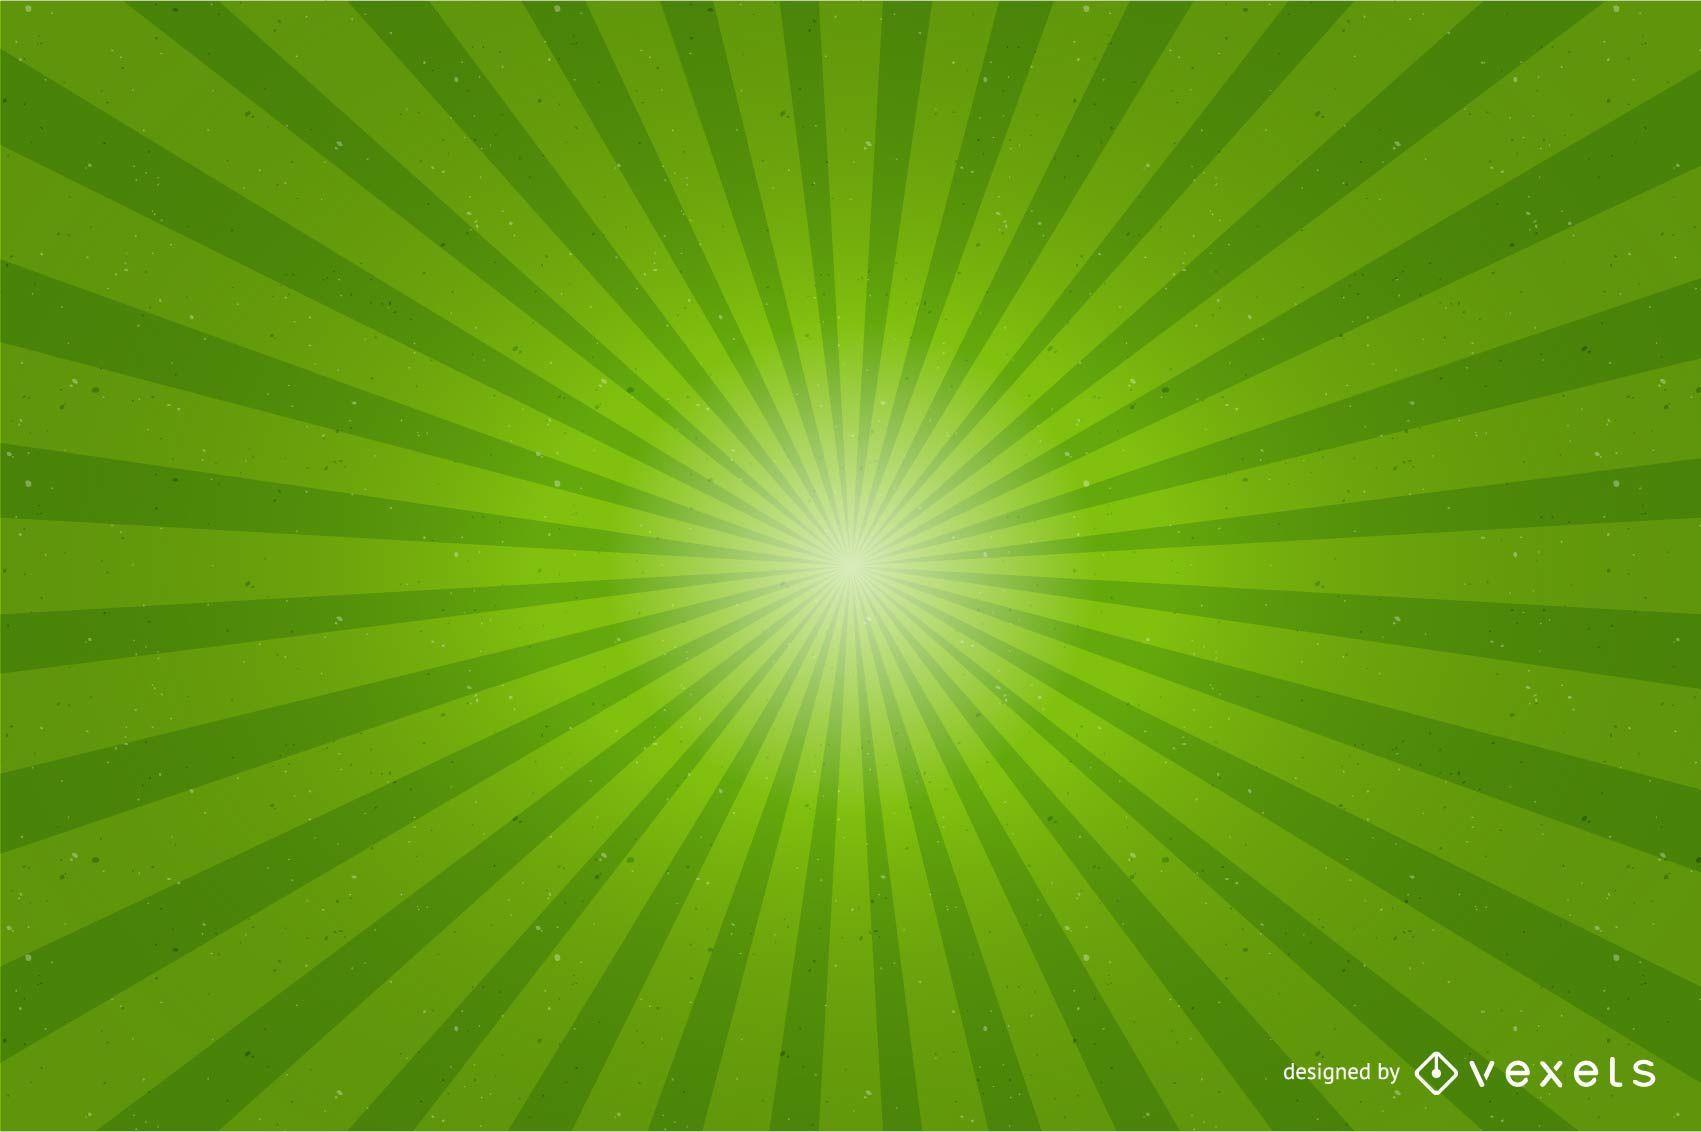 Shiny Green Sunburst Background